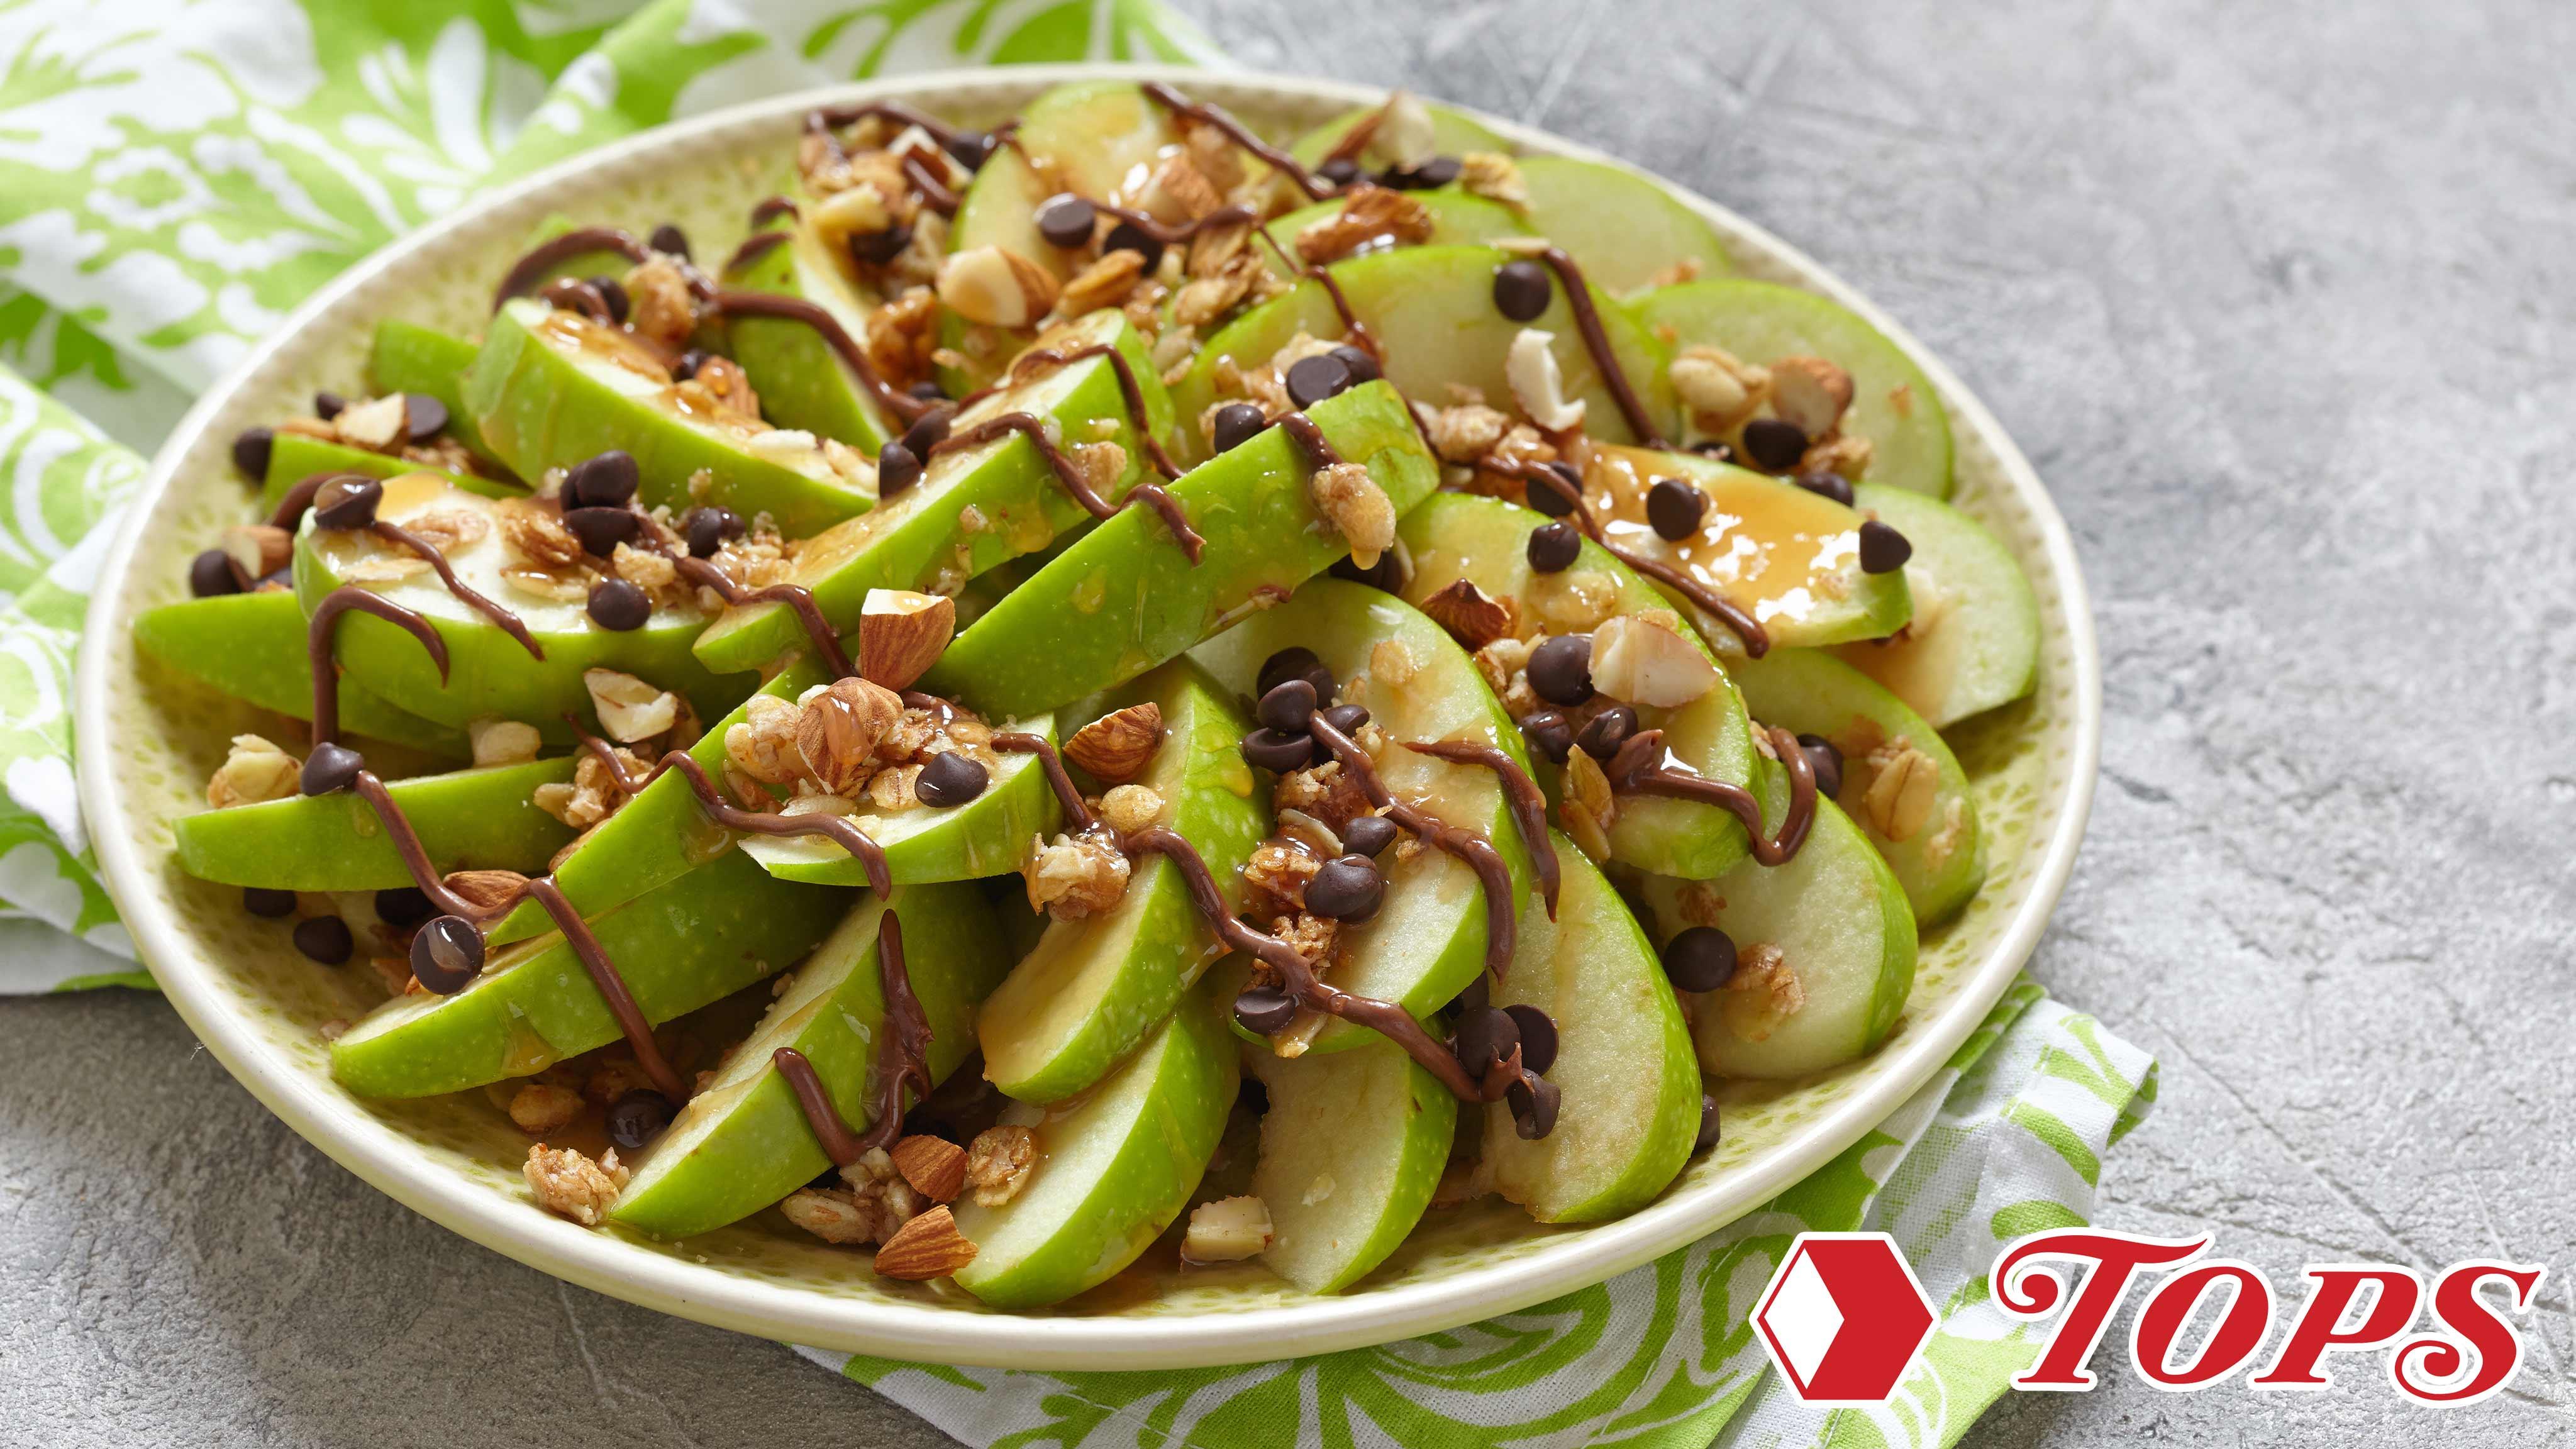 Image for Recipe Easy Caramel Apple Nachos